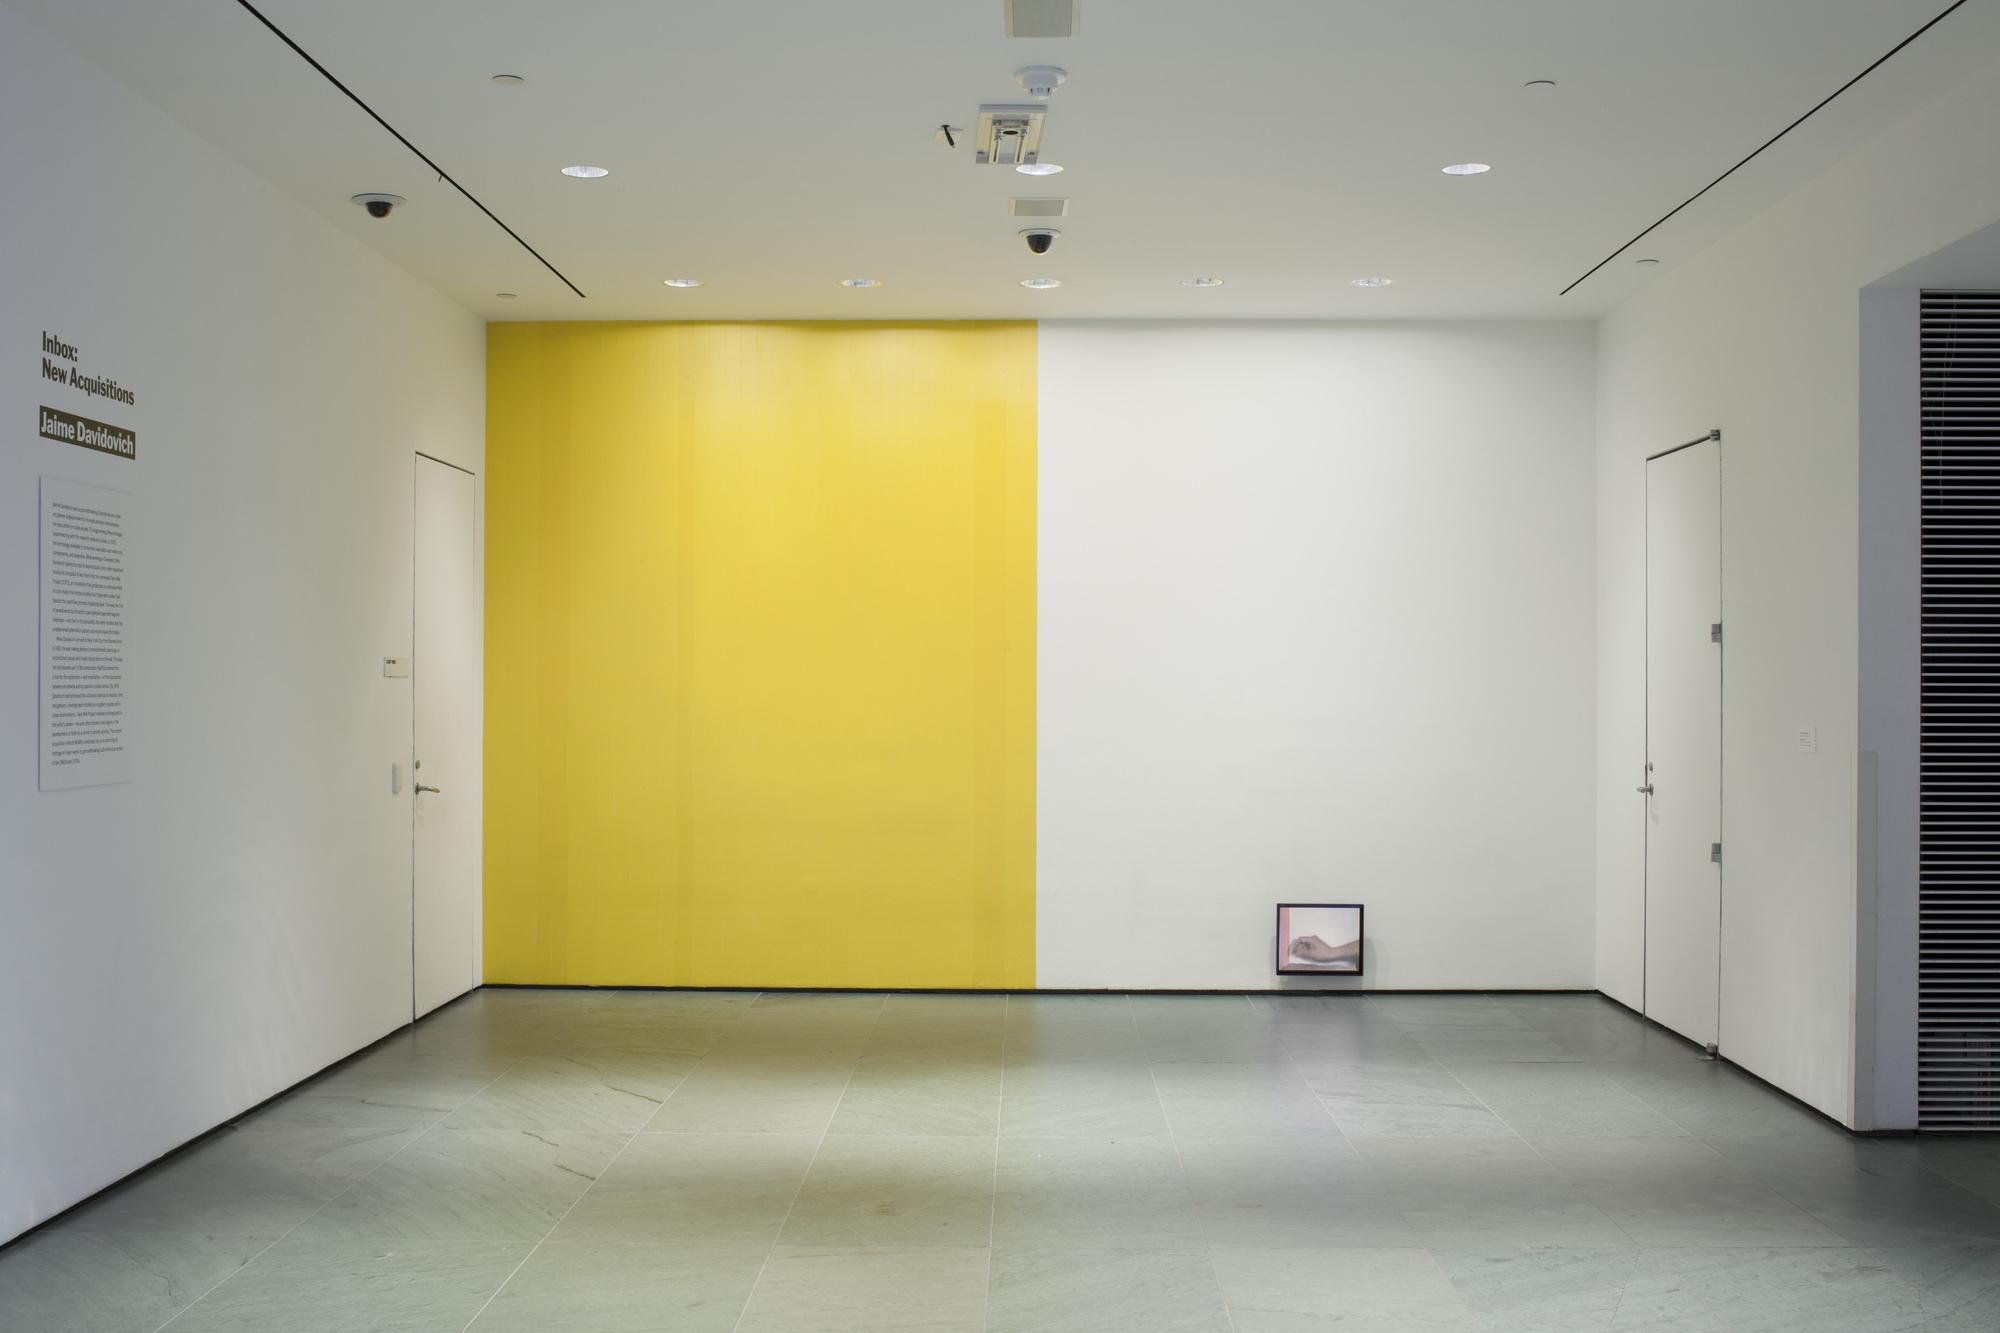 MoMA - Inbox: Jaime DavidovichDecember 15, 2016 - January 29, 201711 W 53rd Street, New York